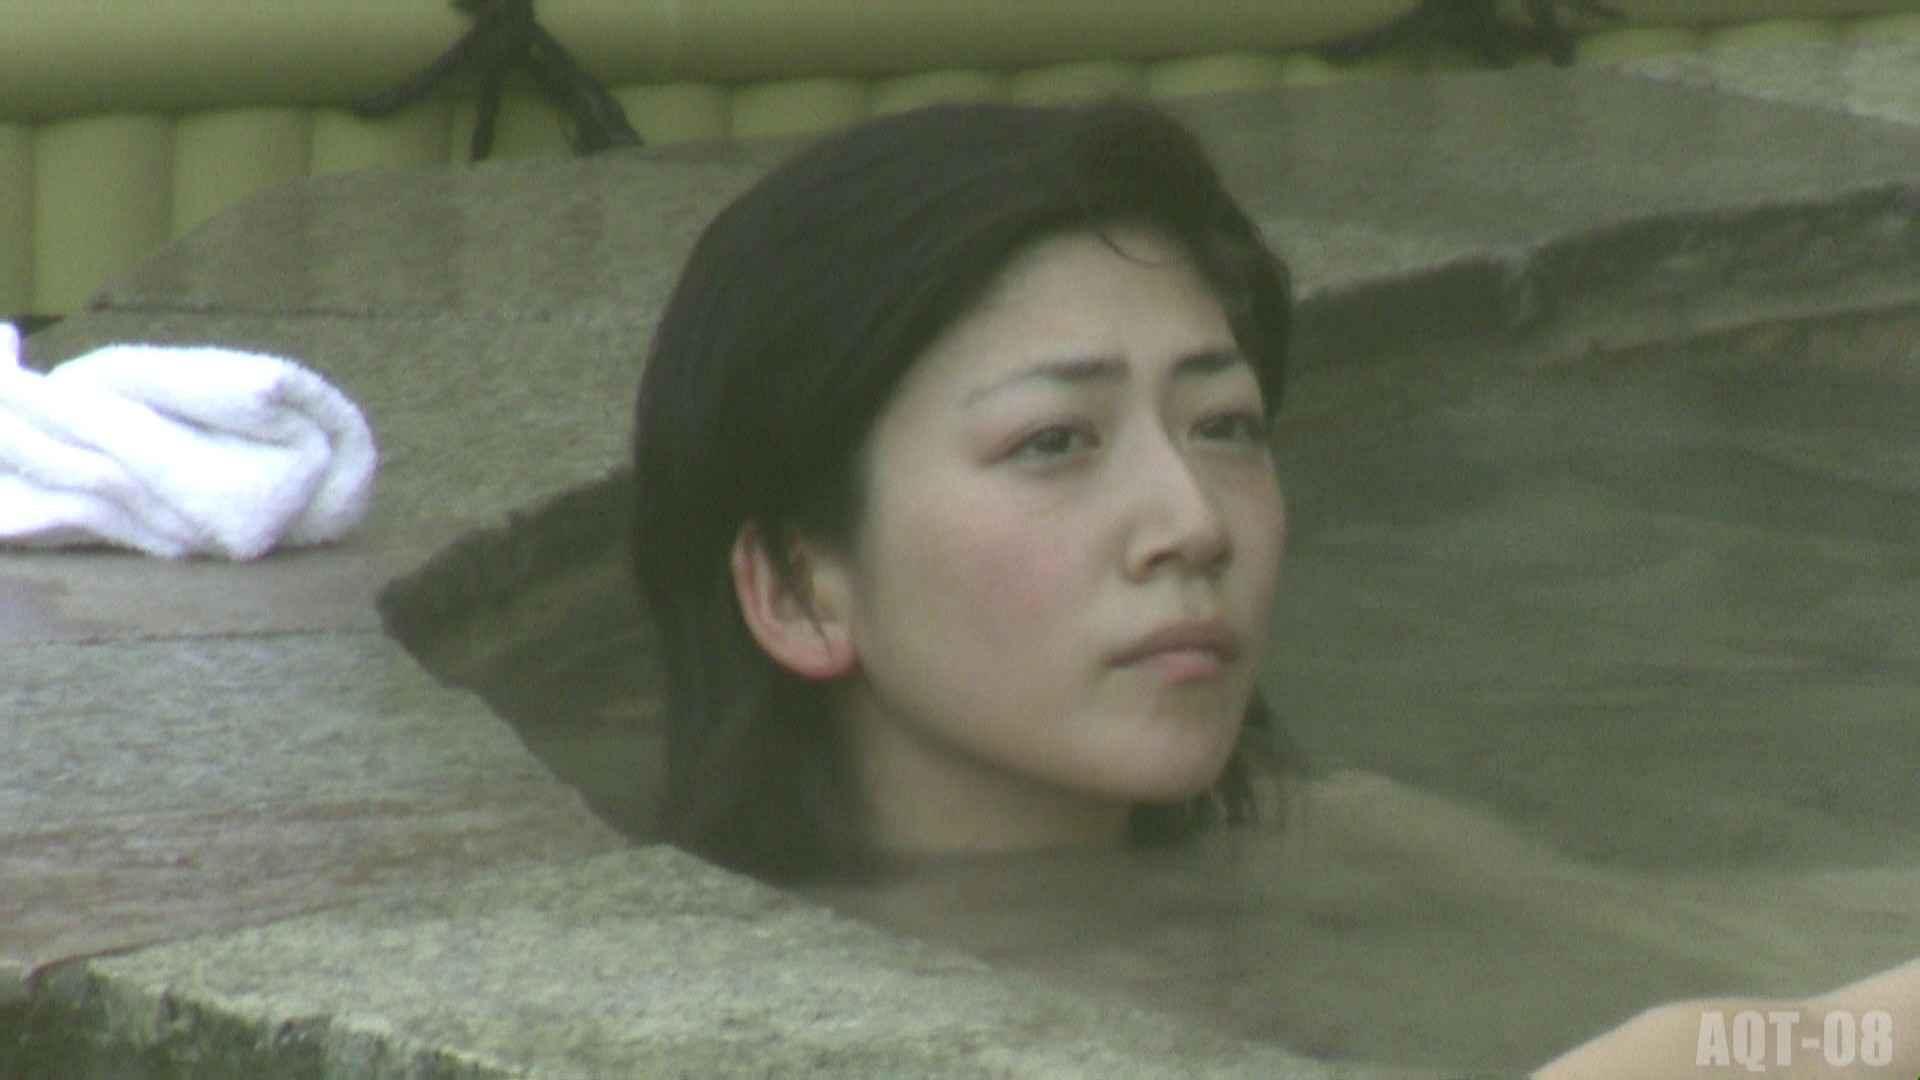 Aquaな露天風呂Vol.776 盗撮 エロ無料画像 108画像 35